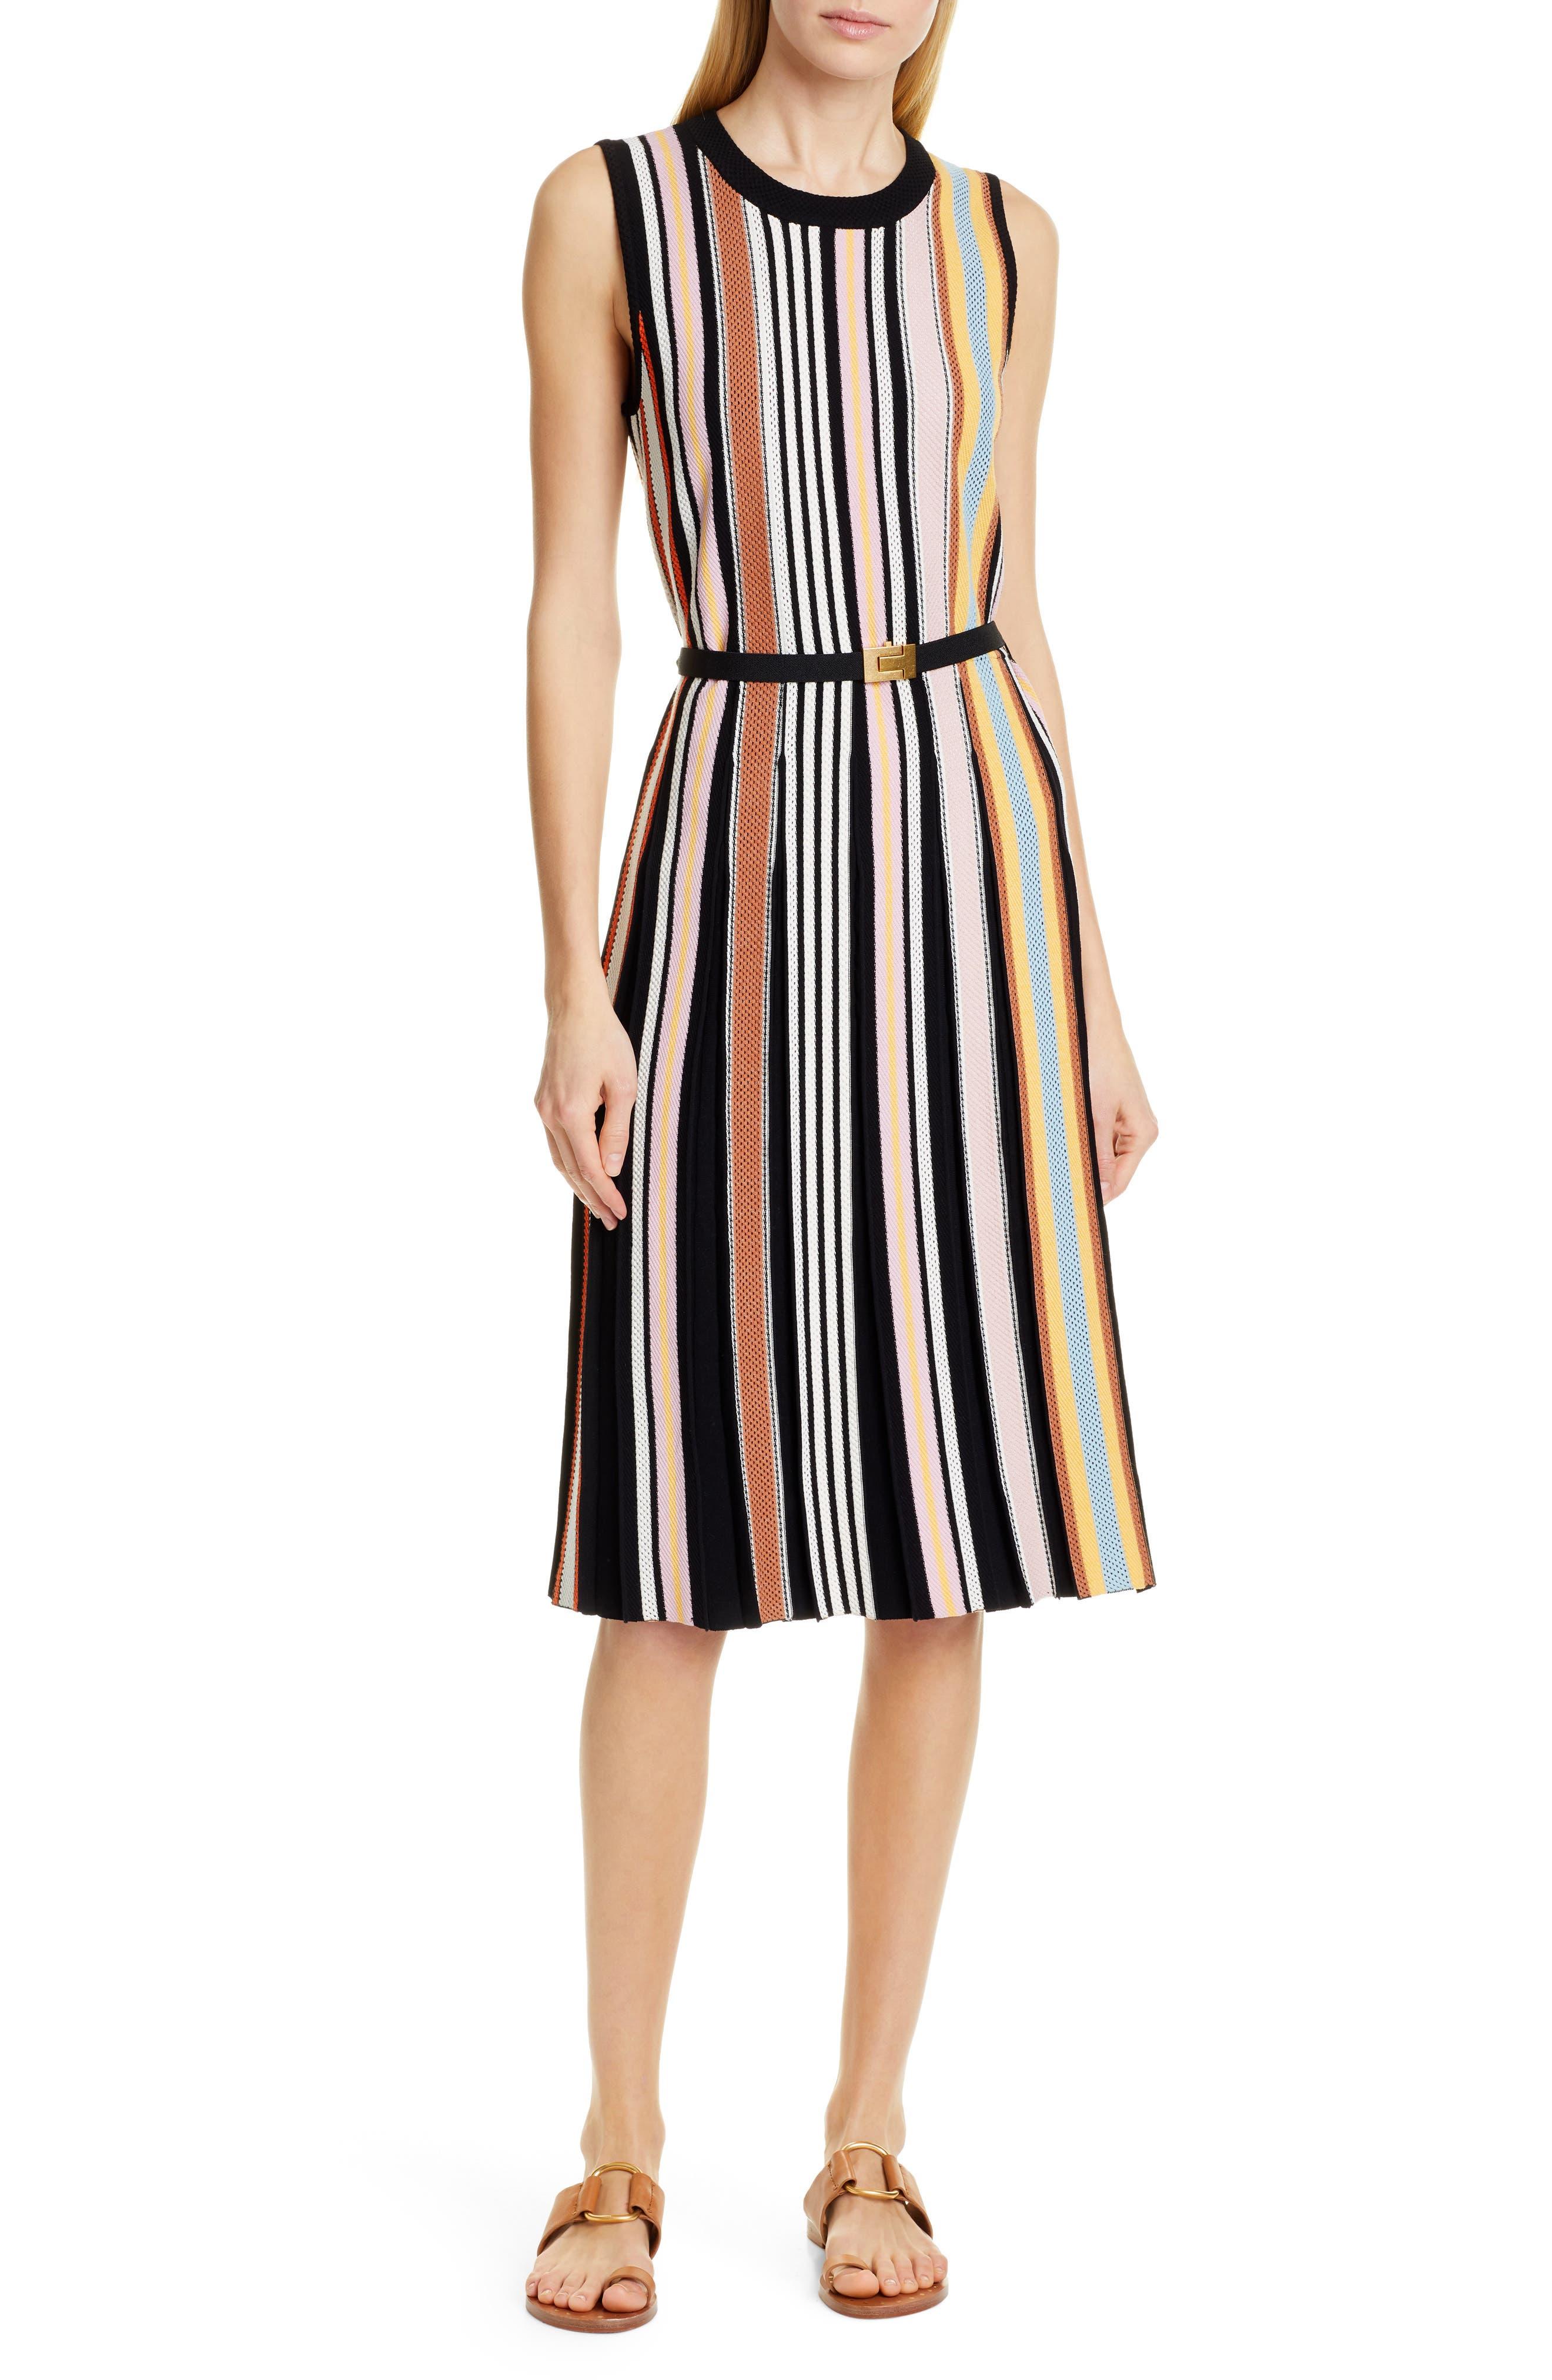 TORY BURCH, Stripe Sweater Dress, Main thumbnail 1, color, WEBBING STRIPE